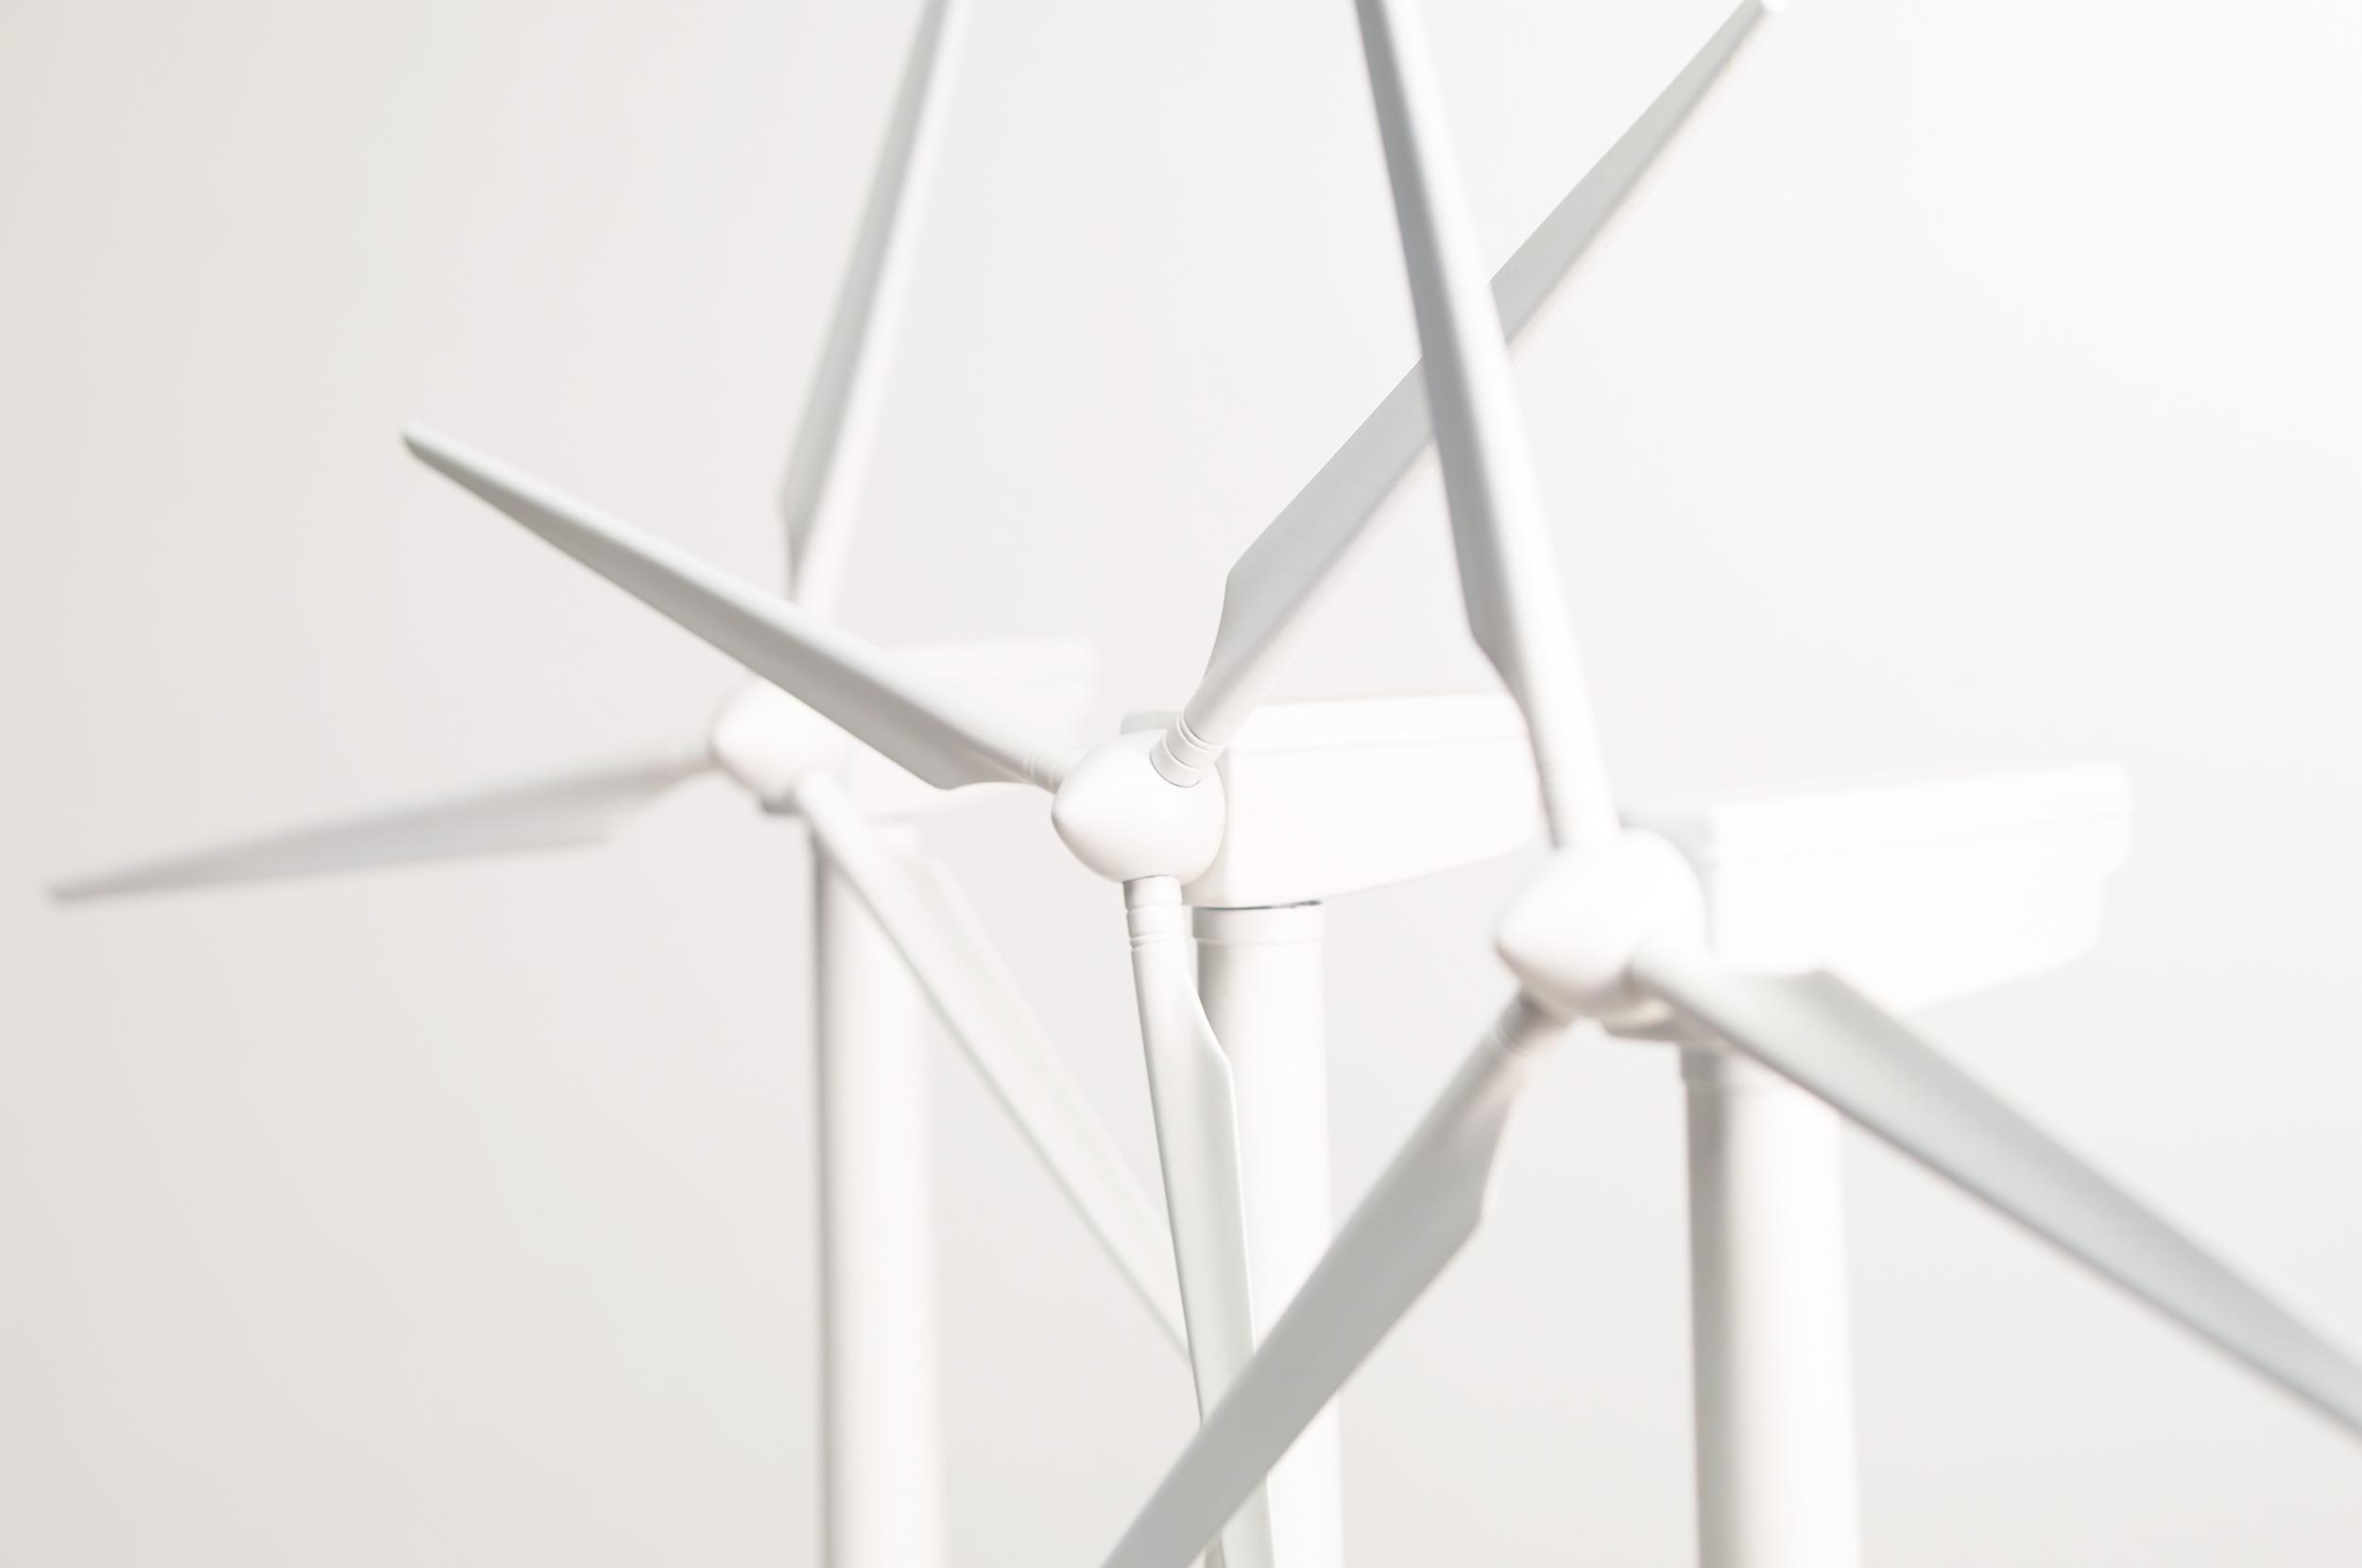 _170106 Post and Gleam table top Windmill4 R1 FLLR.jpg